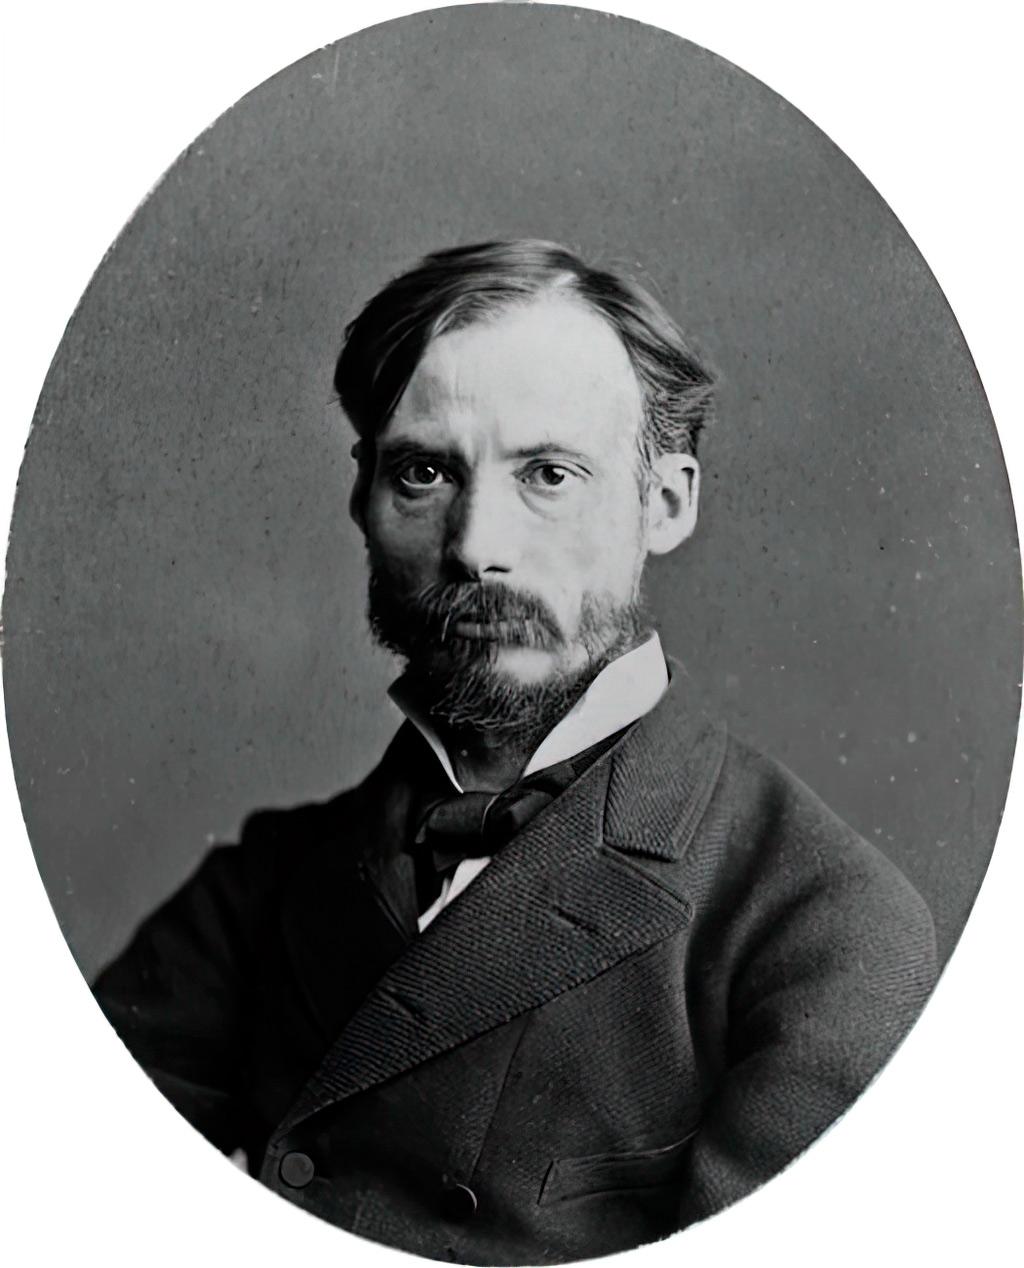 Artist: Renoir, Pierre-Auguste